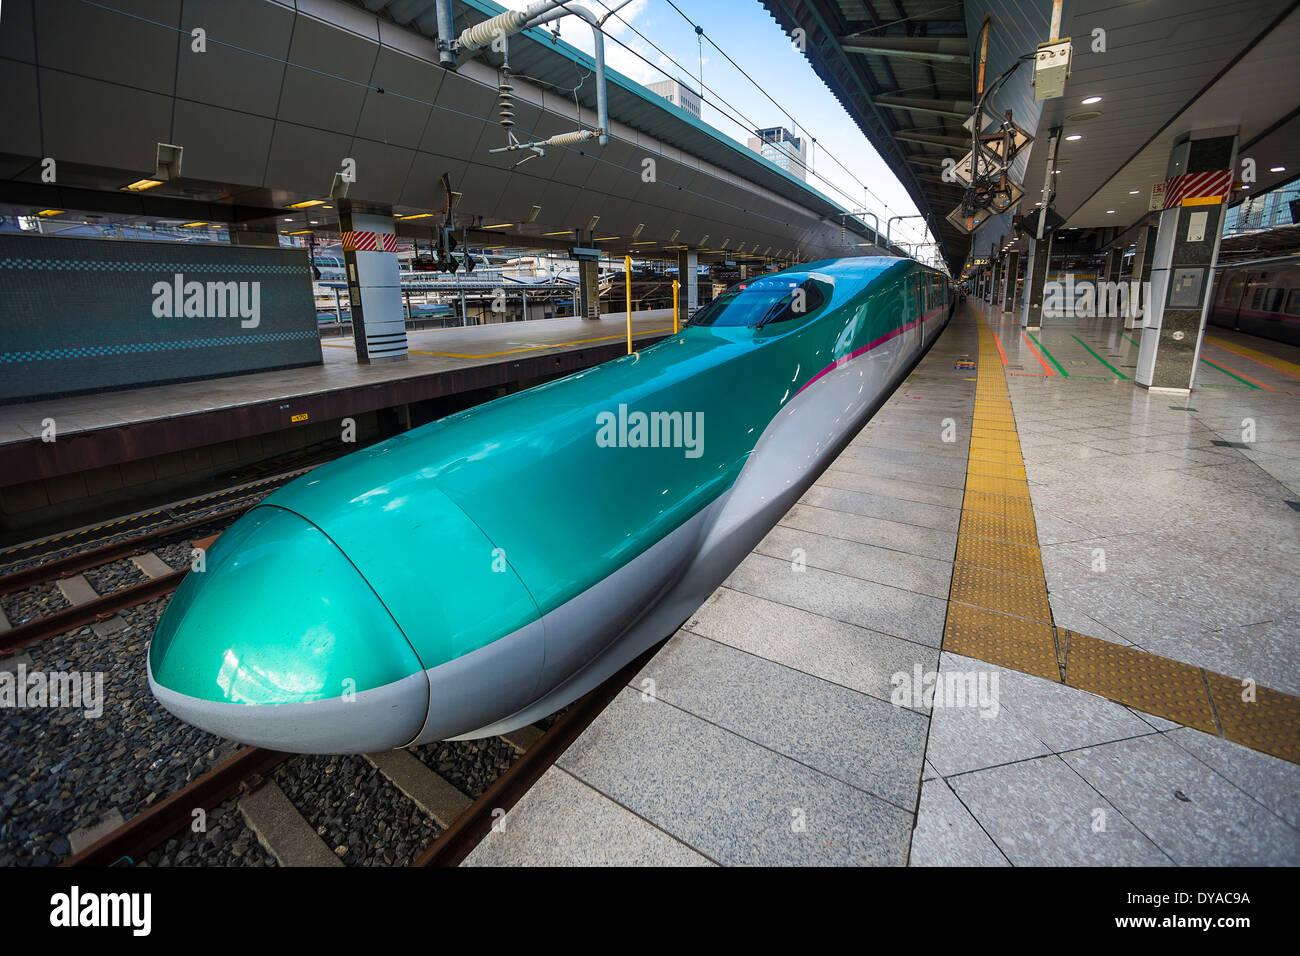 Japan, Asia, Tokyo, Hayabusa, bullet, Bullet train, high speed, city, design, fast, futuristic, green, new, station, Stock Photo